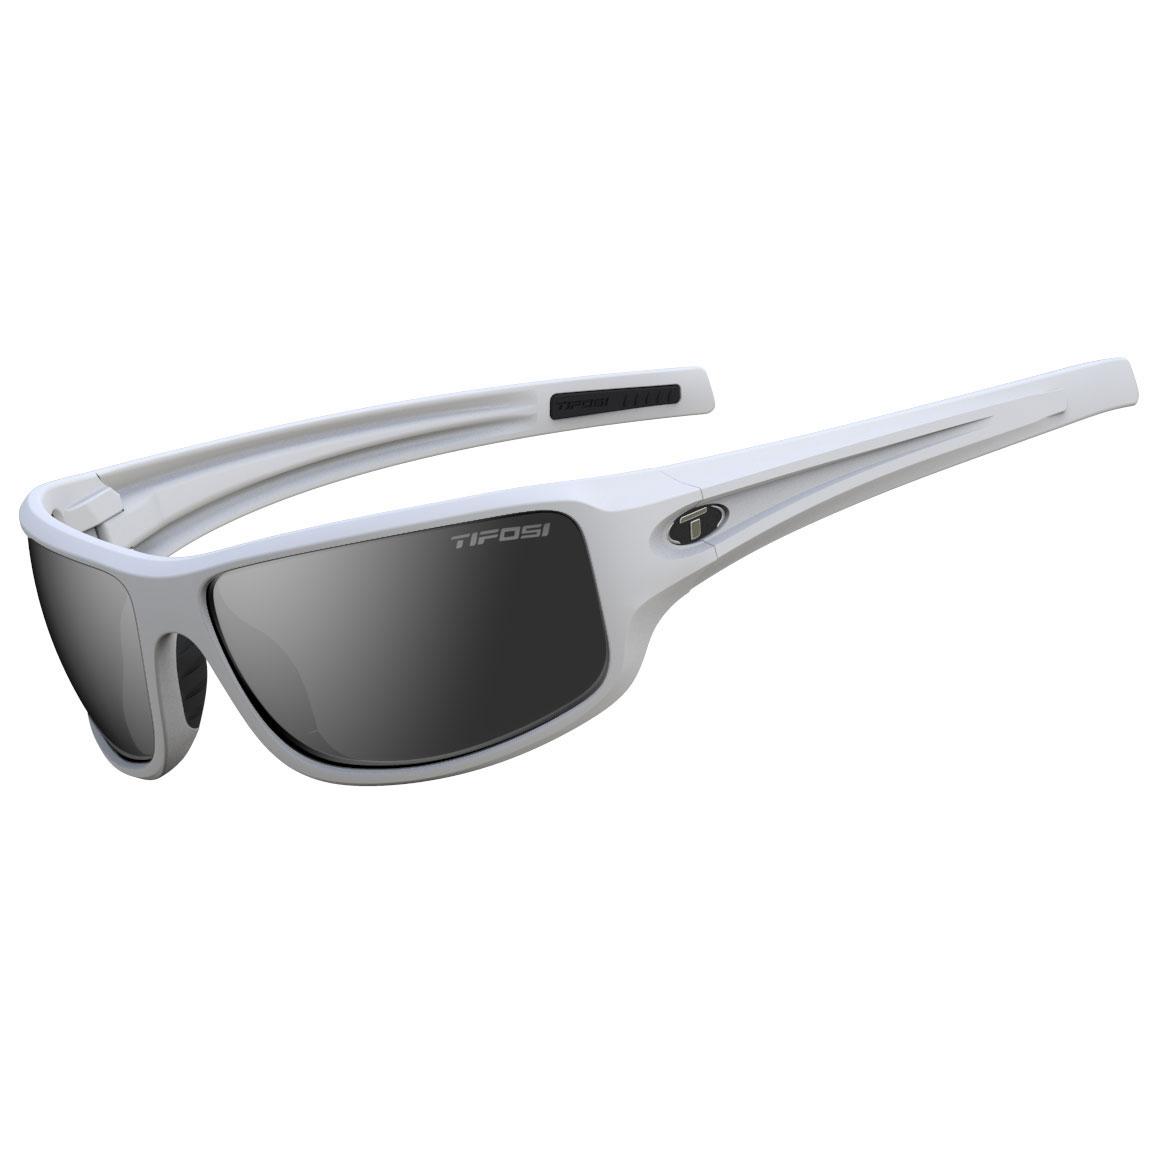 ed57253809 Tifosi BRONX Matte White Smoke Sunglasses - ShopGolfSunglasses.com